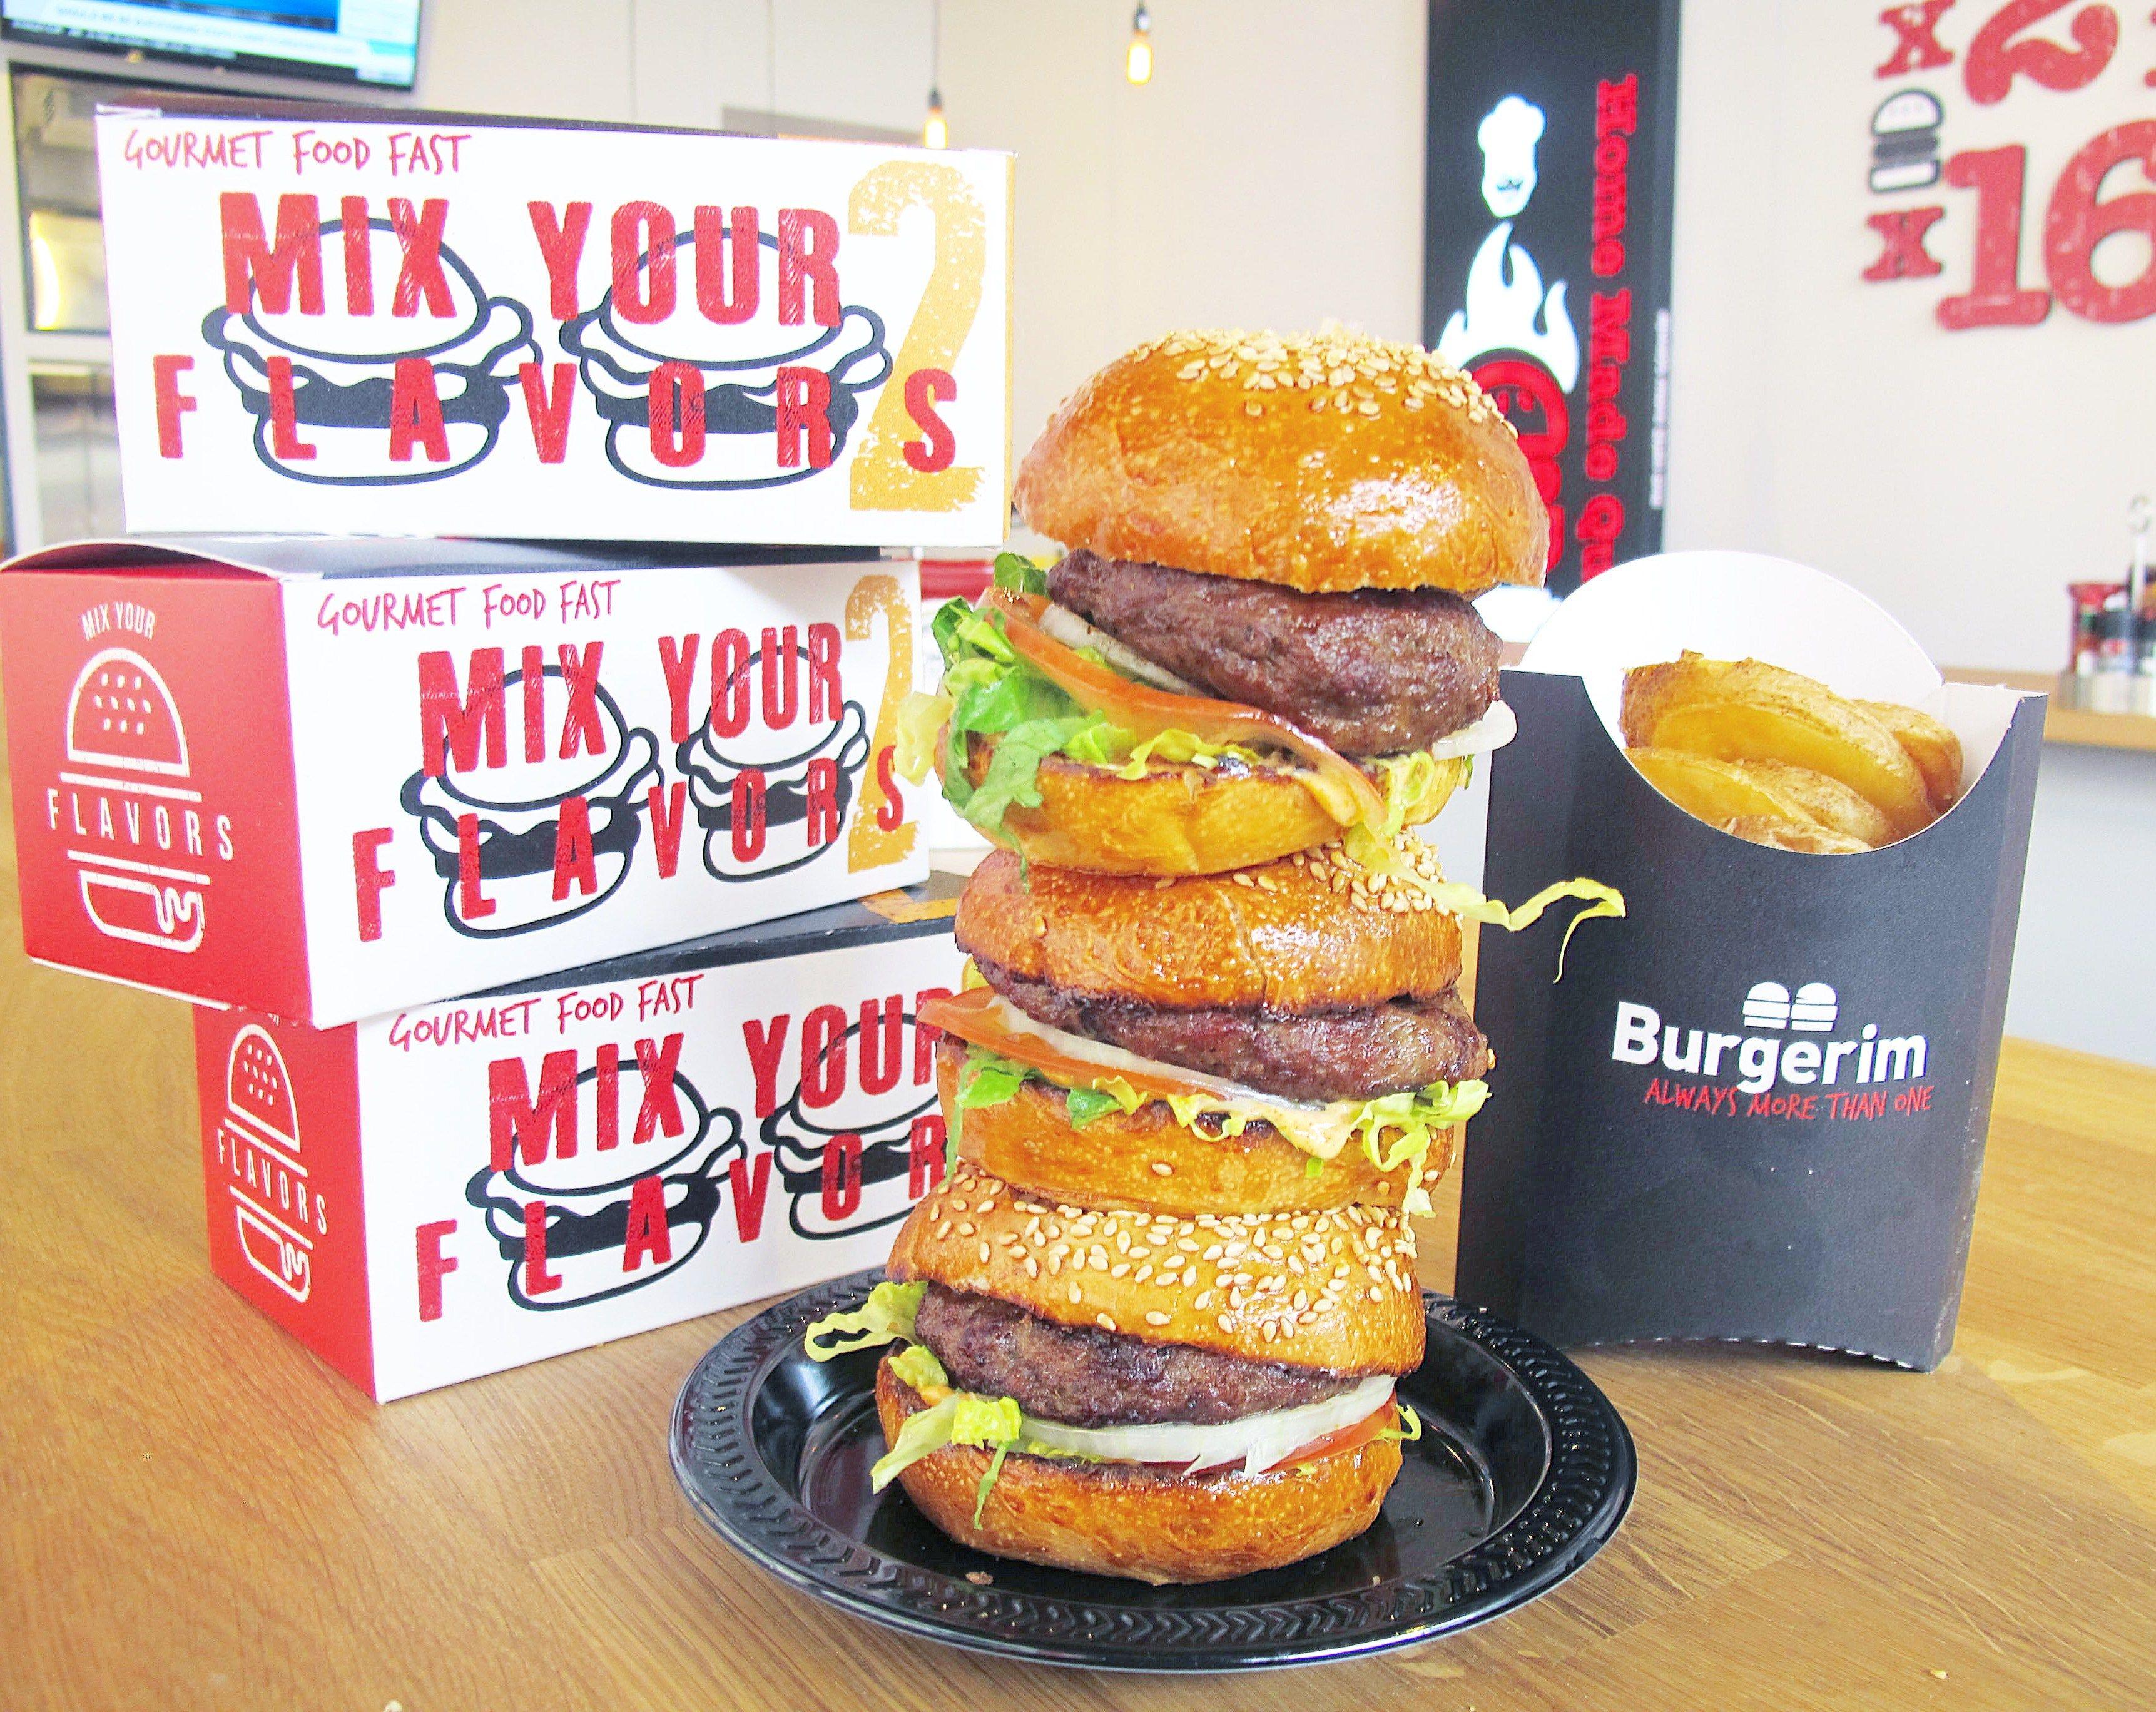 Sneak Peak at Burgerim USA first US Location in Hollywoood